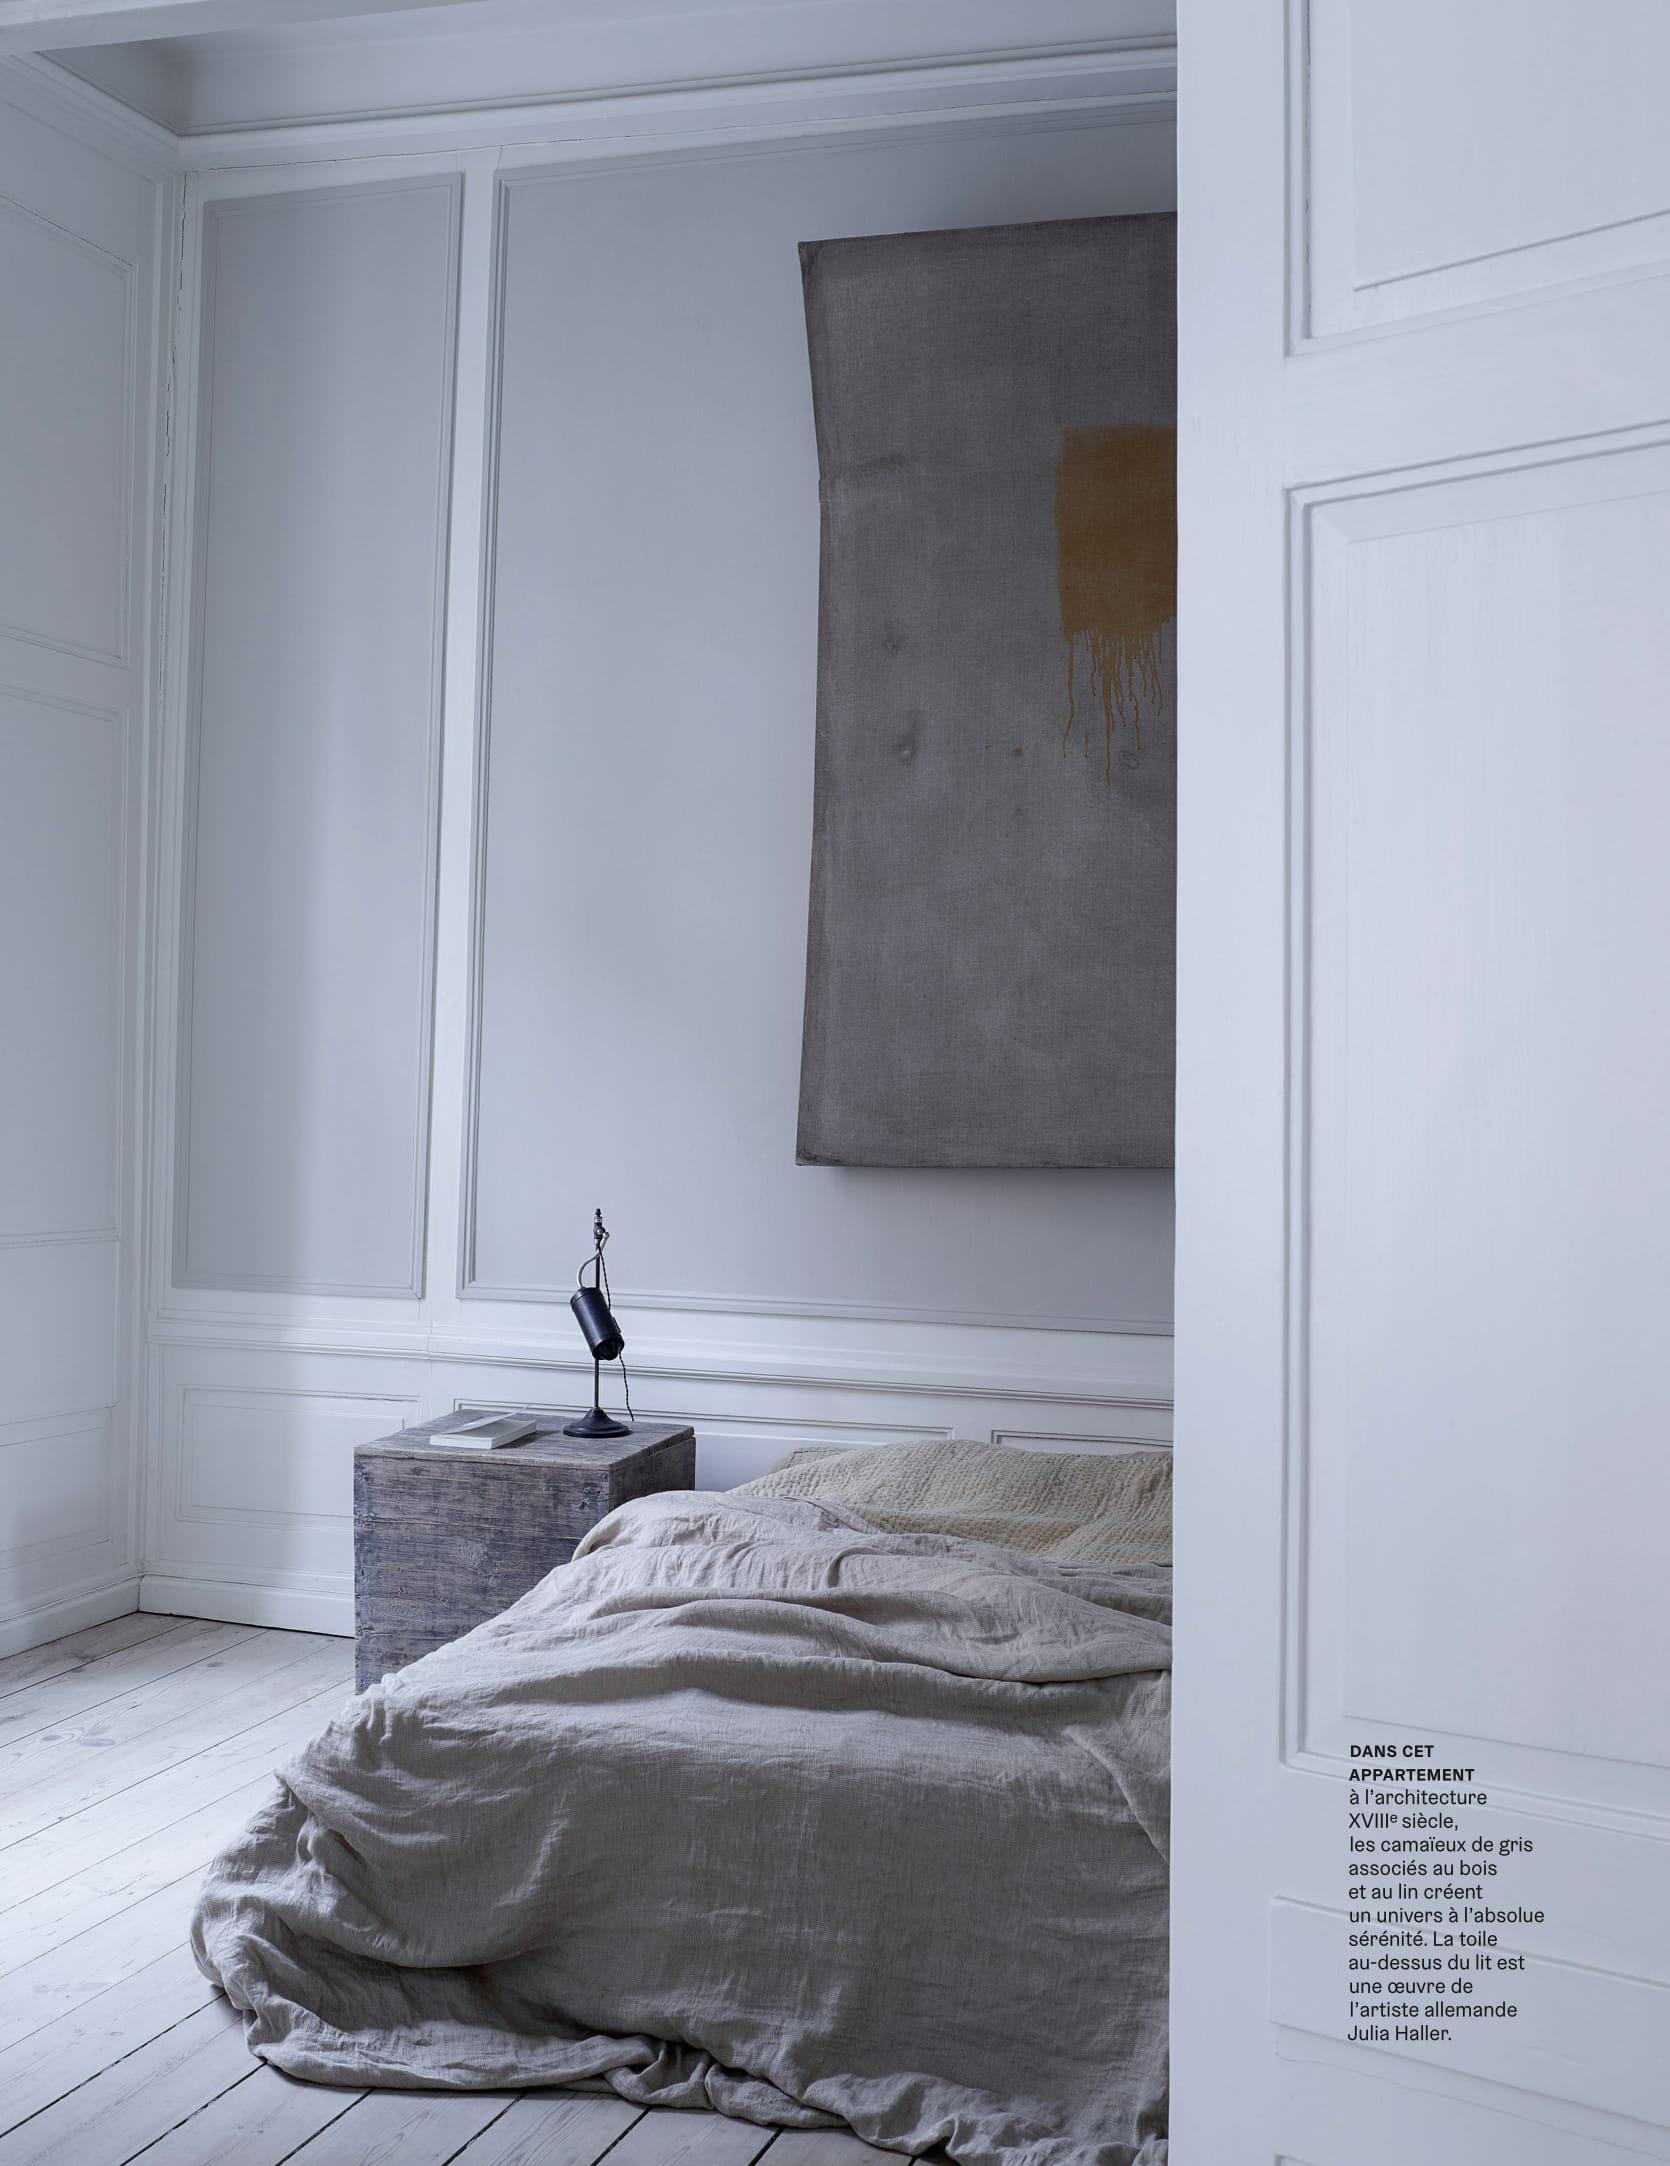 architectural digest France interview with danish designer Oliver Gustav